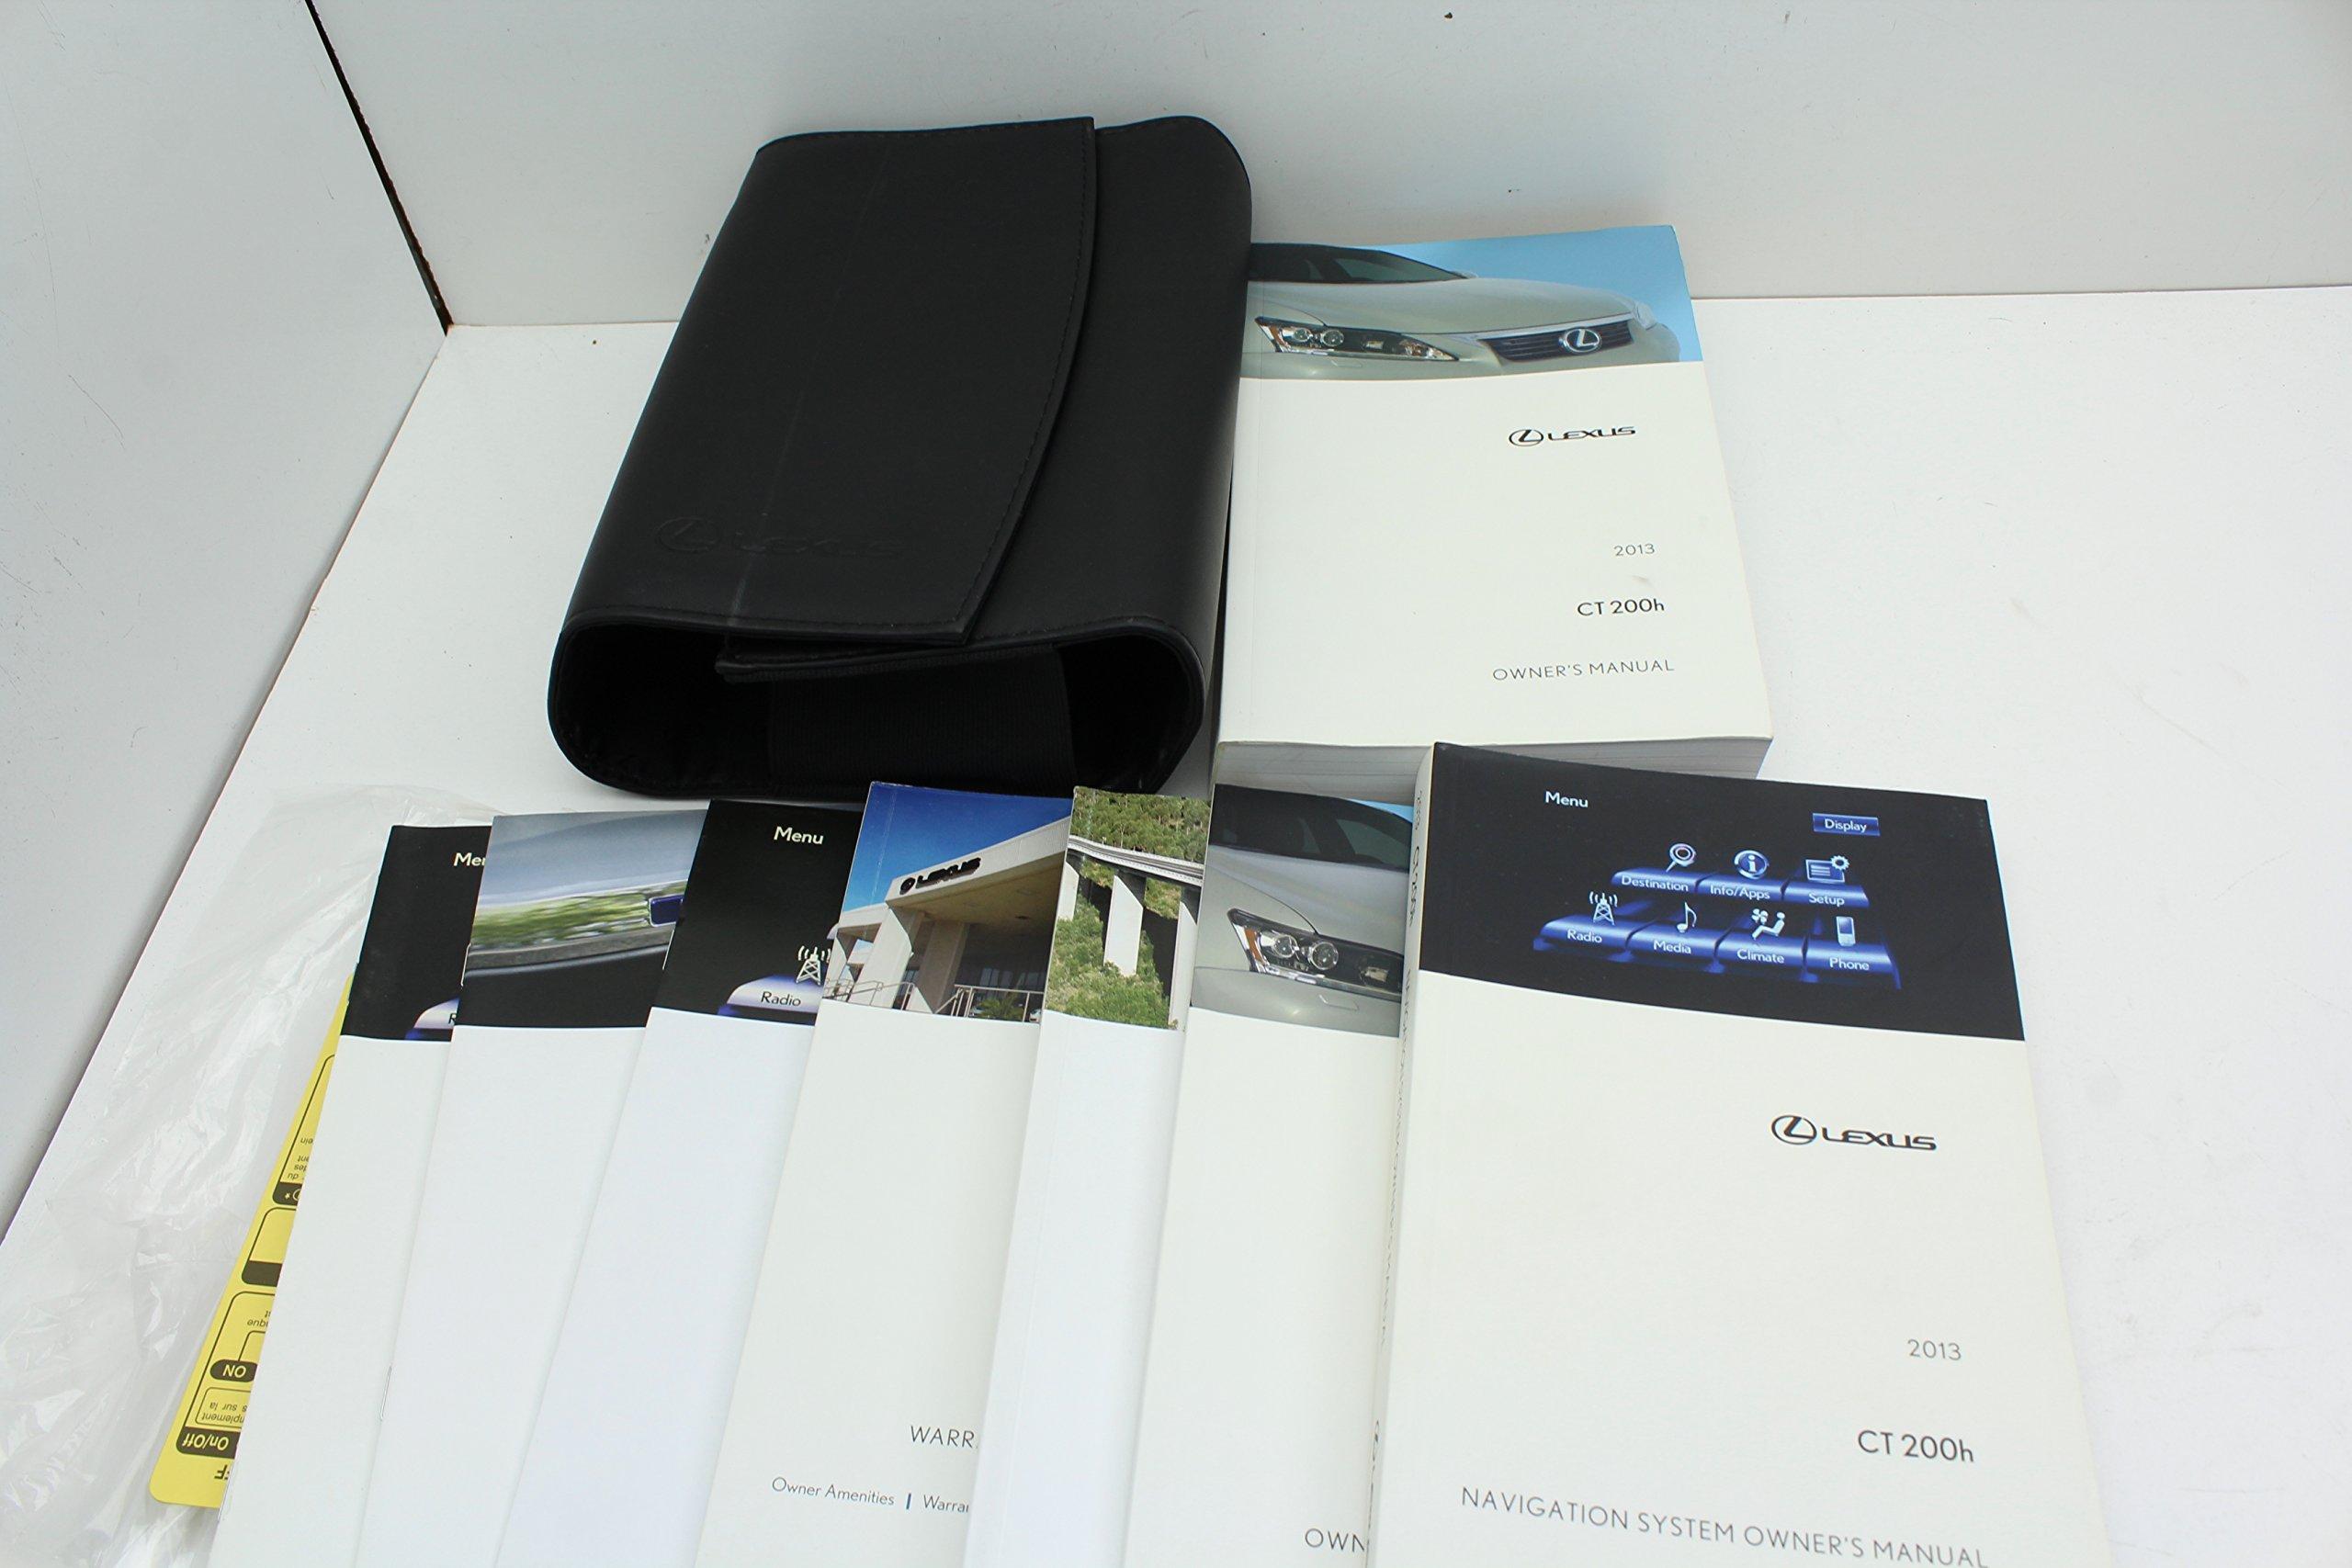 2013 lexus ct200h owners manual amazon com books rh amazon com lexus ct200h owner's manual 2016 ct200h owners manual